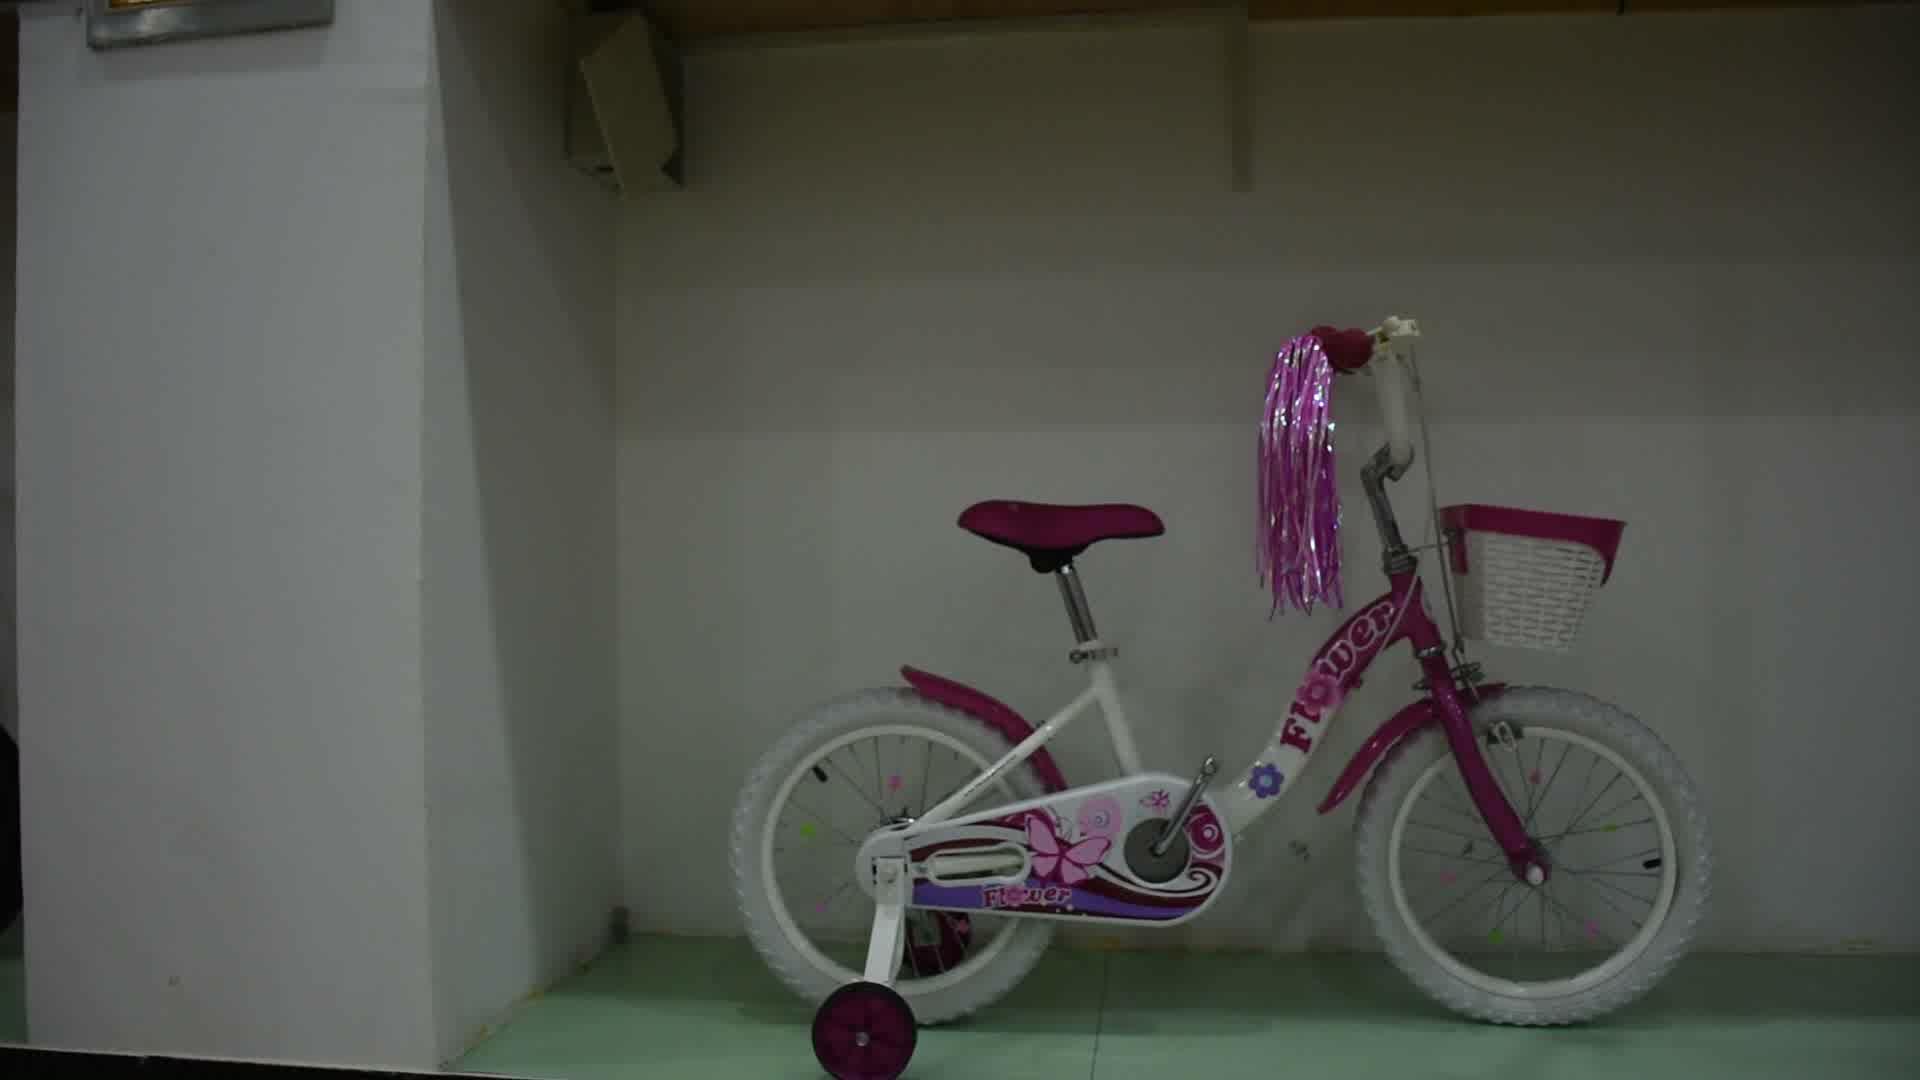 chinesische kinder fahrrad herstellung gro handel. Black Bedroom Furniture Sets. Home Design Ideas